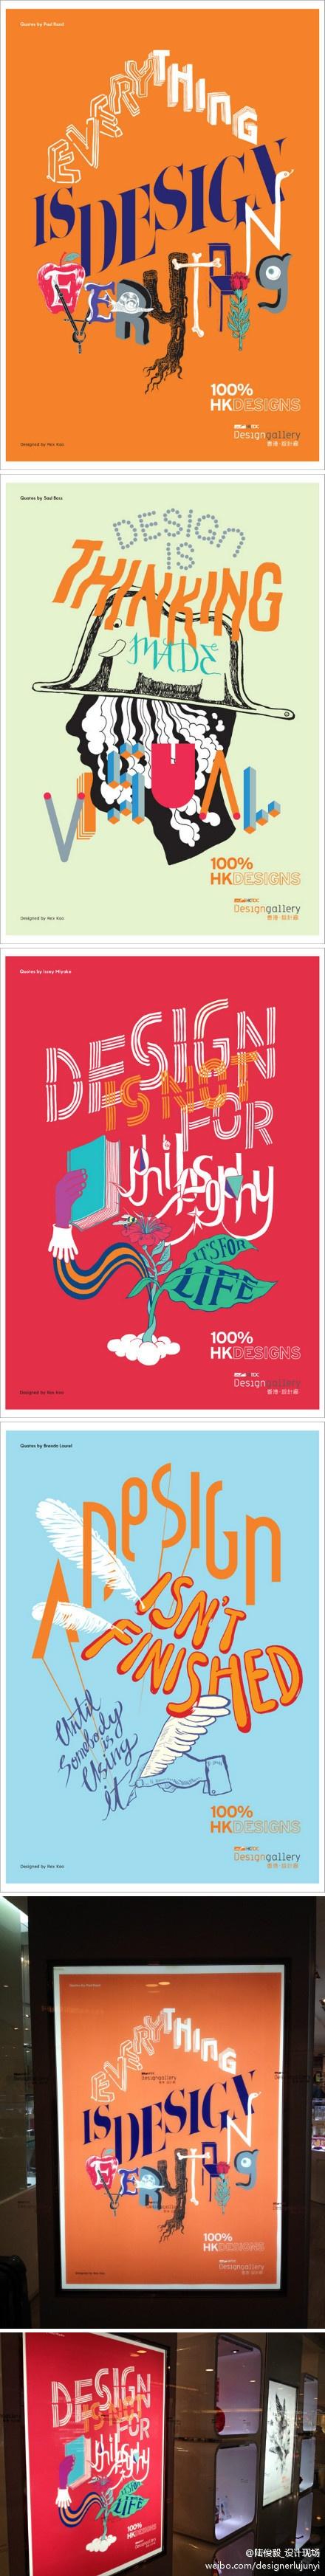 Poster design hong kong - Hong Kong Design Gallery Rexkoo